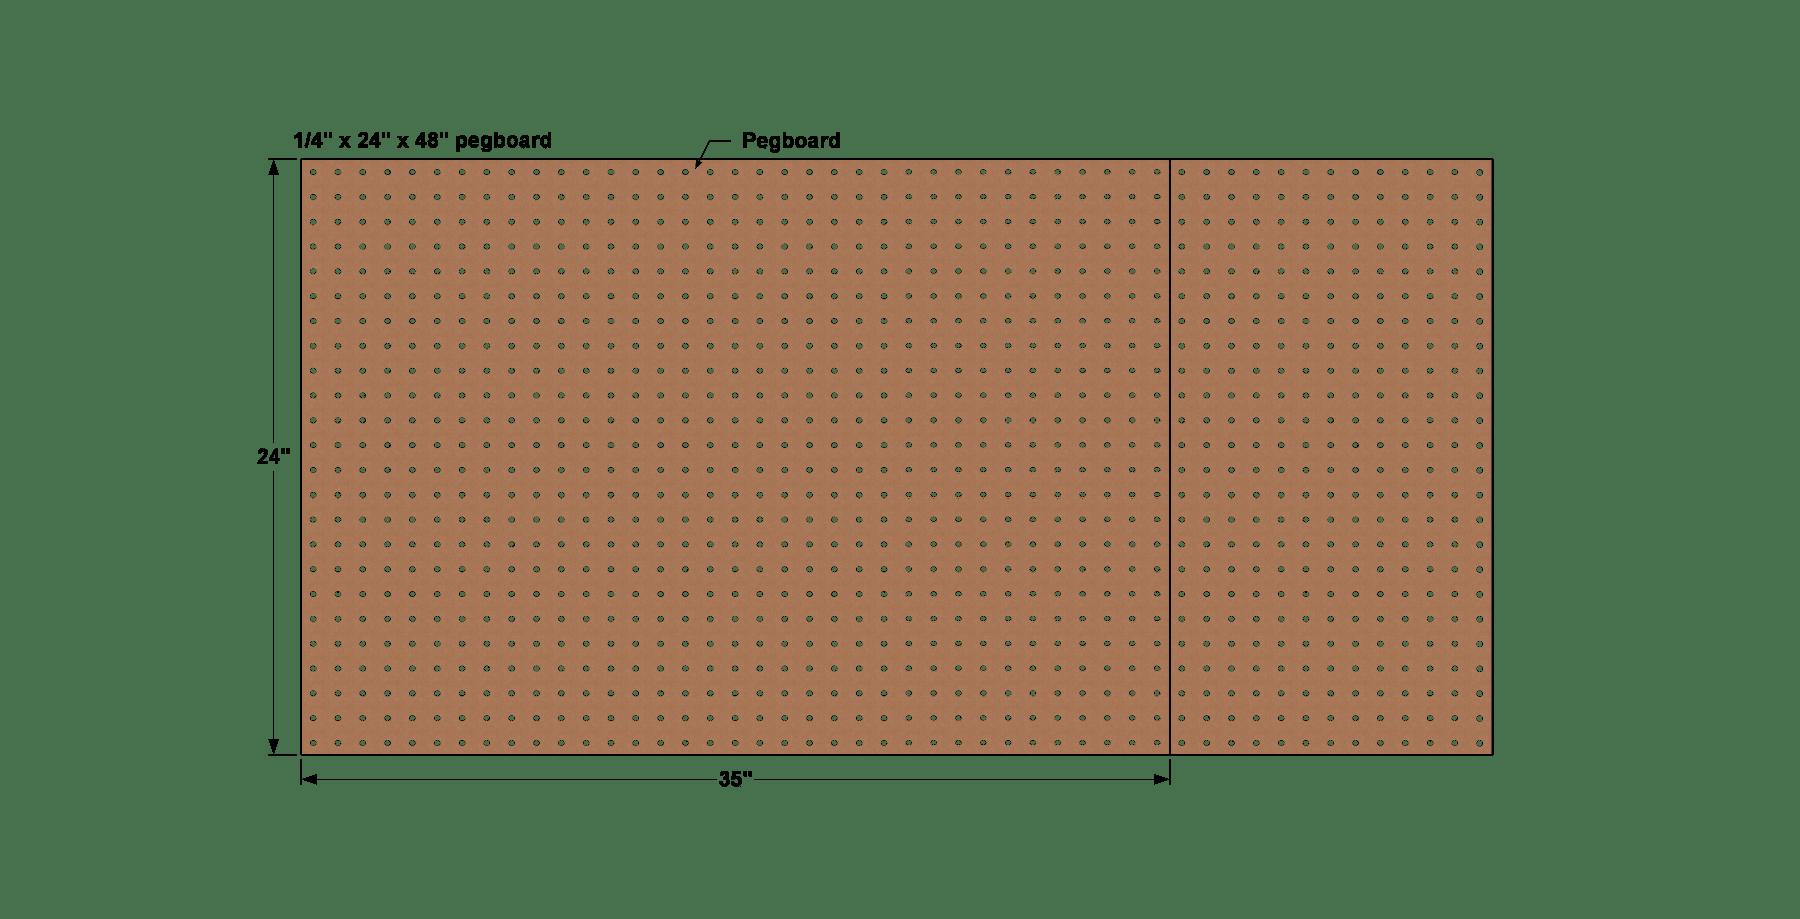 tool-storage-center-cut-diagram-pegboard